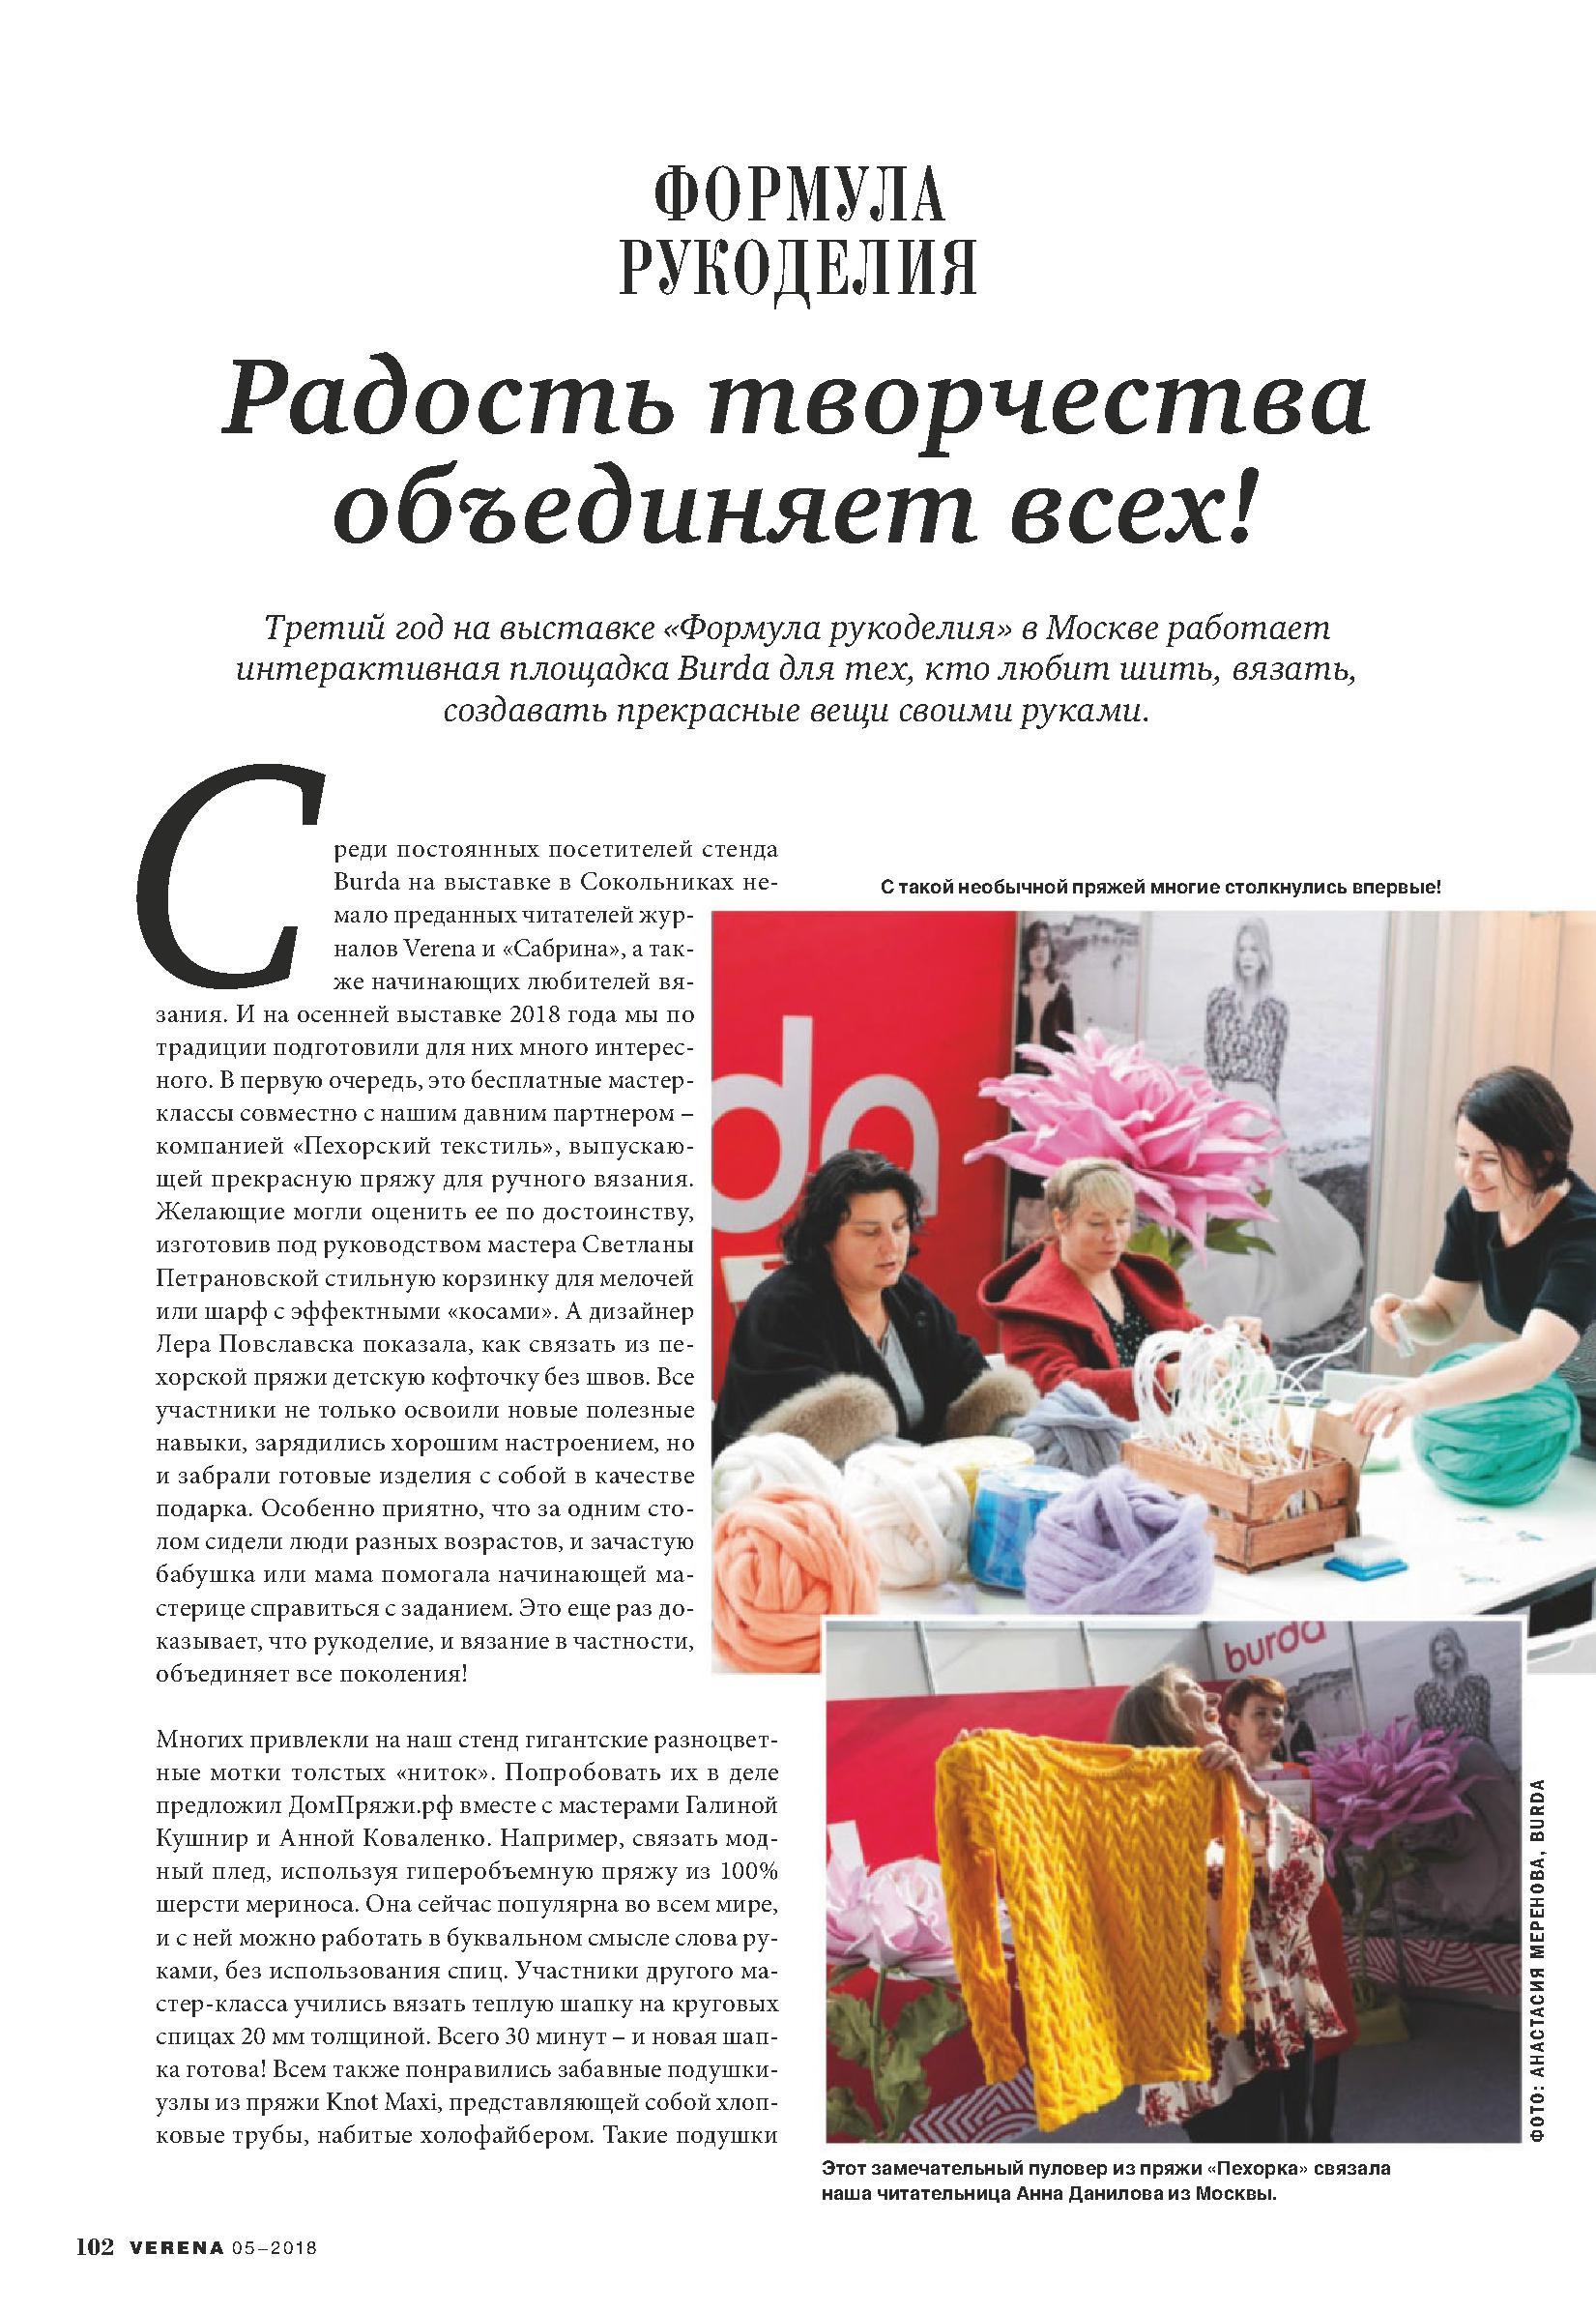 Page_00103.jpg